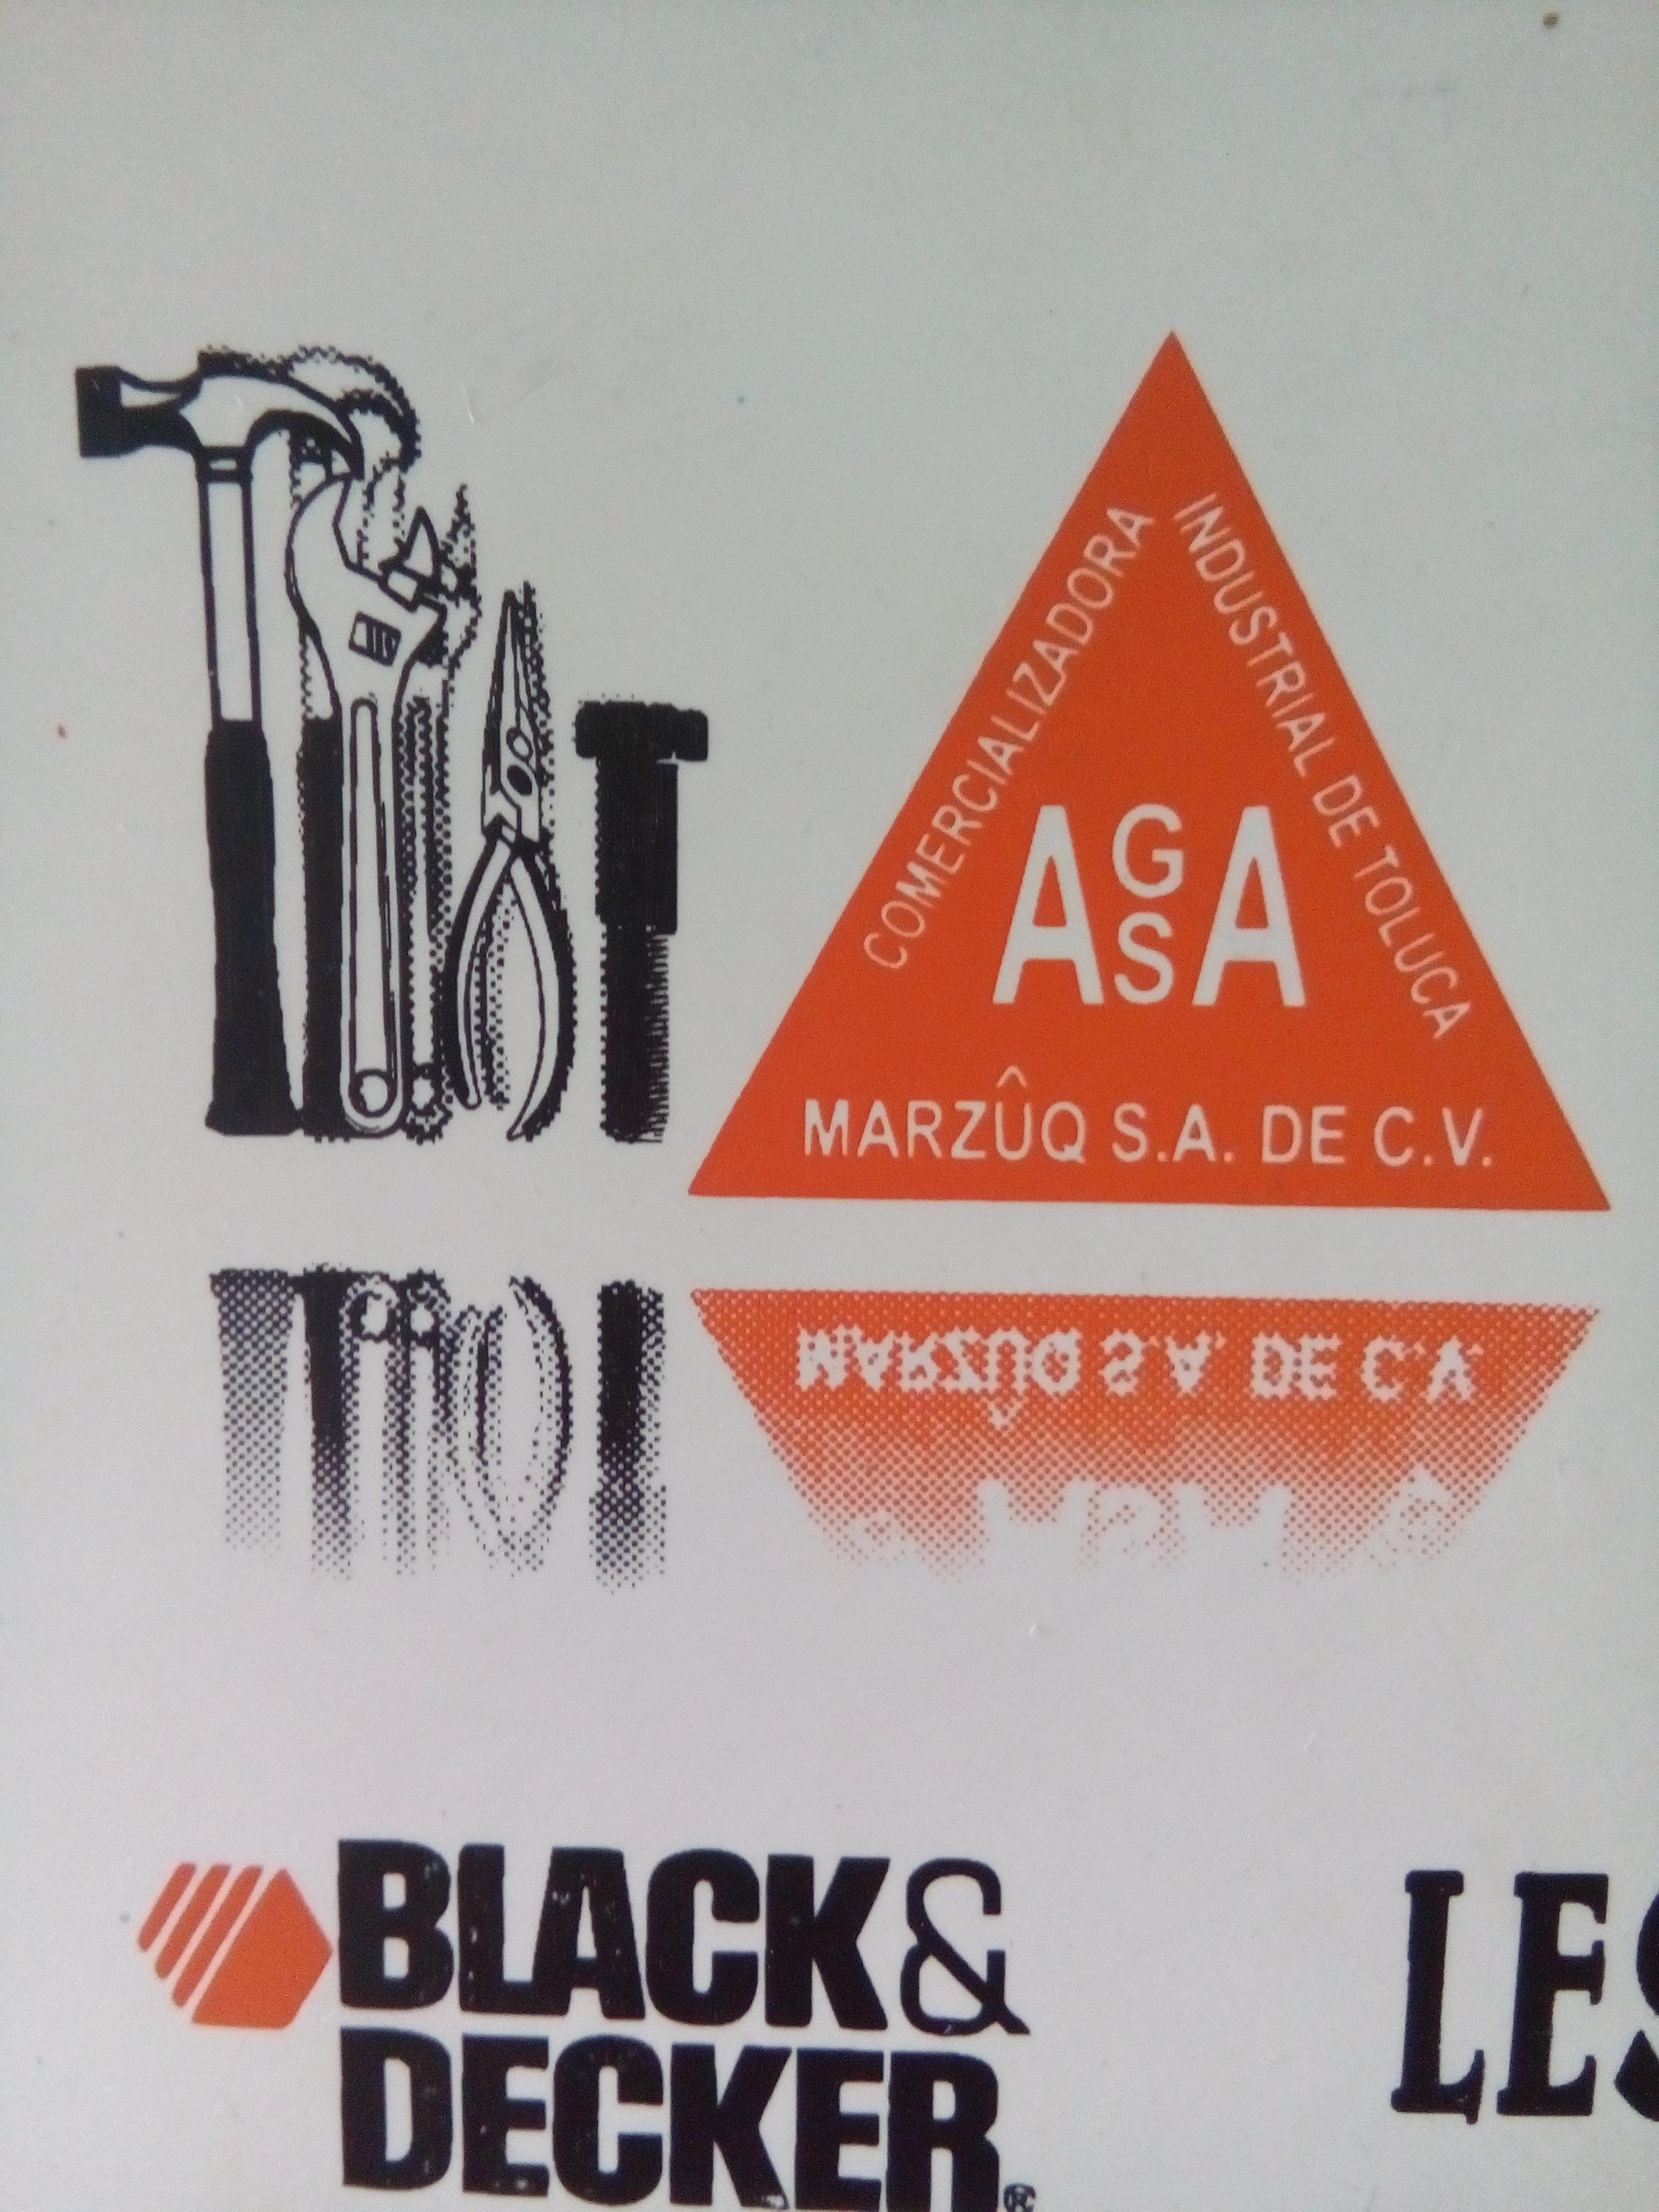 COMERCIALIZADORA AGSA MARZUQ